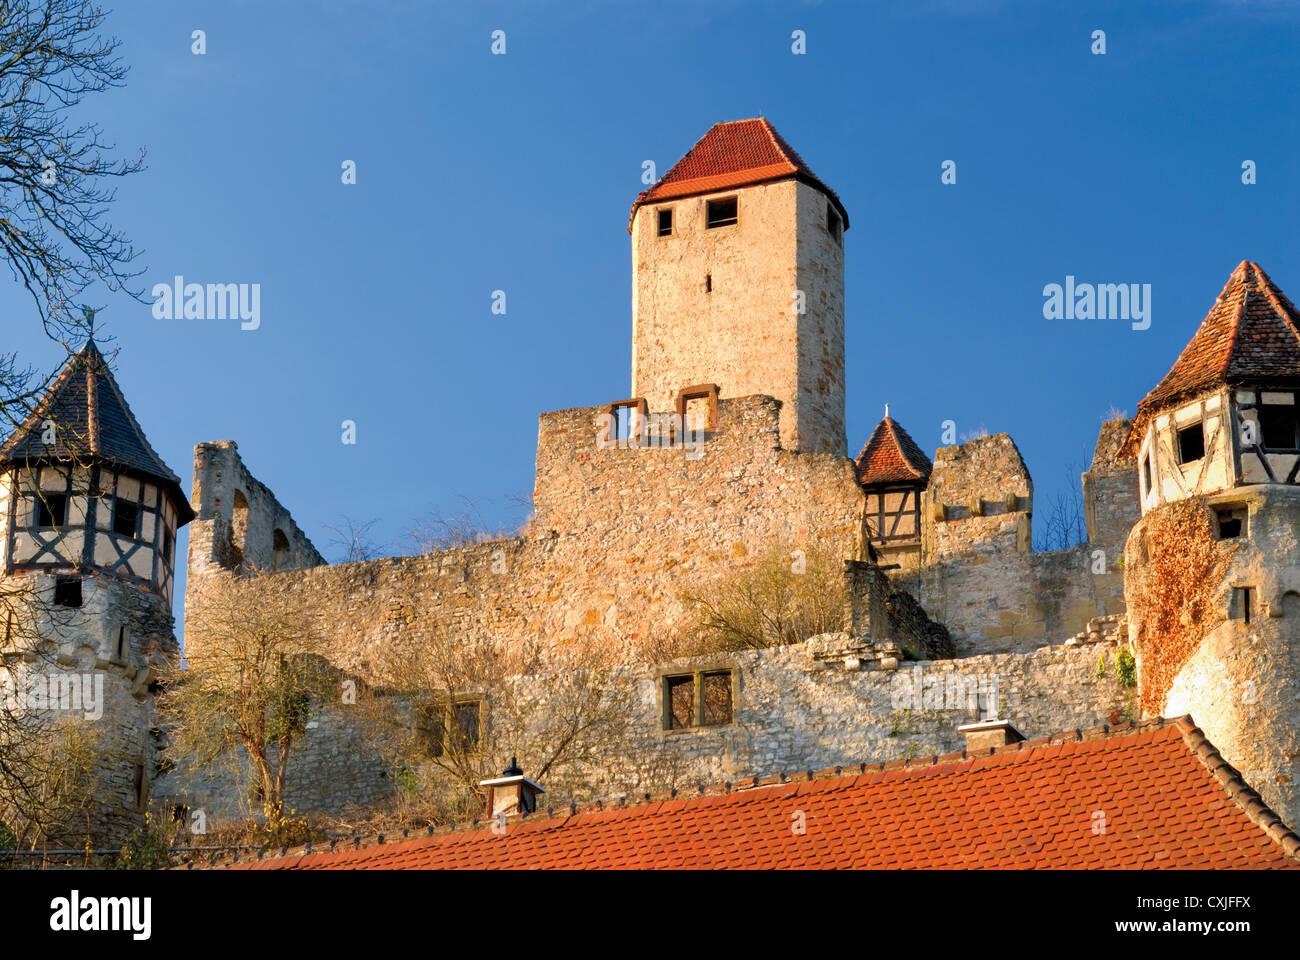 germany baden w rttemberg medieval castle burg hornberg in stock photo royalty free image. Black Bedroom Furniture Sets. Home Design Ideas